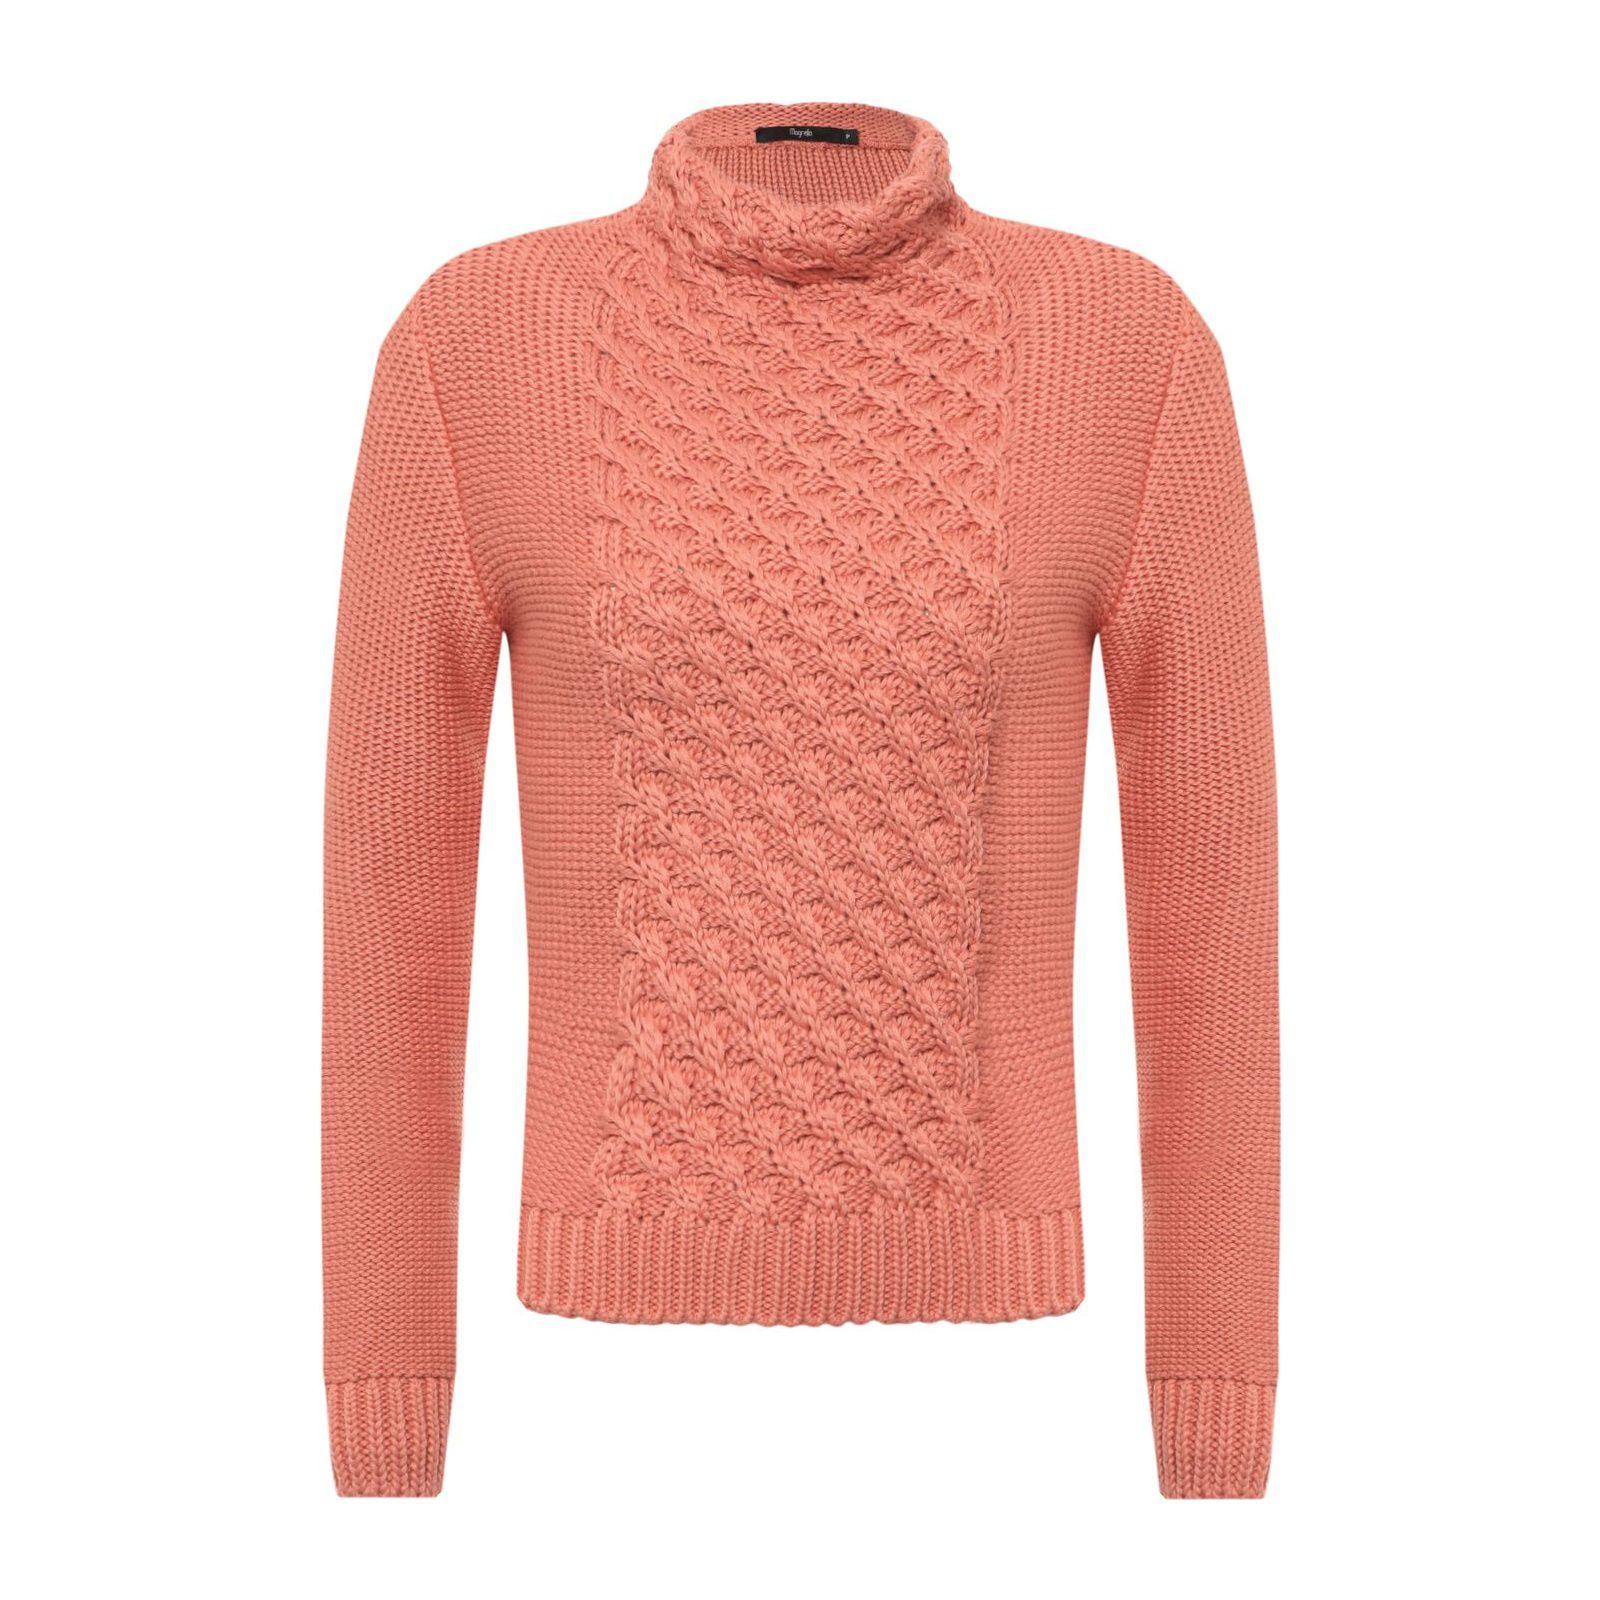 Blusa Tricot Cosmetic - Rosa